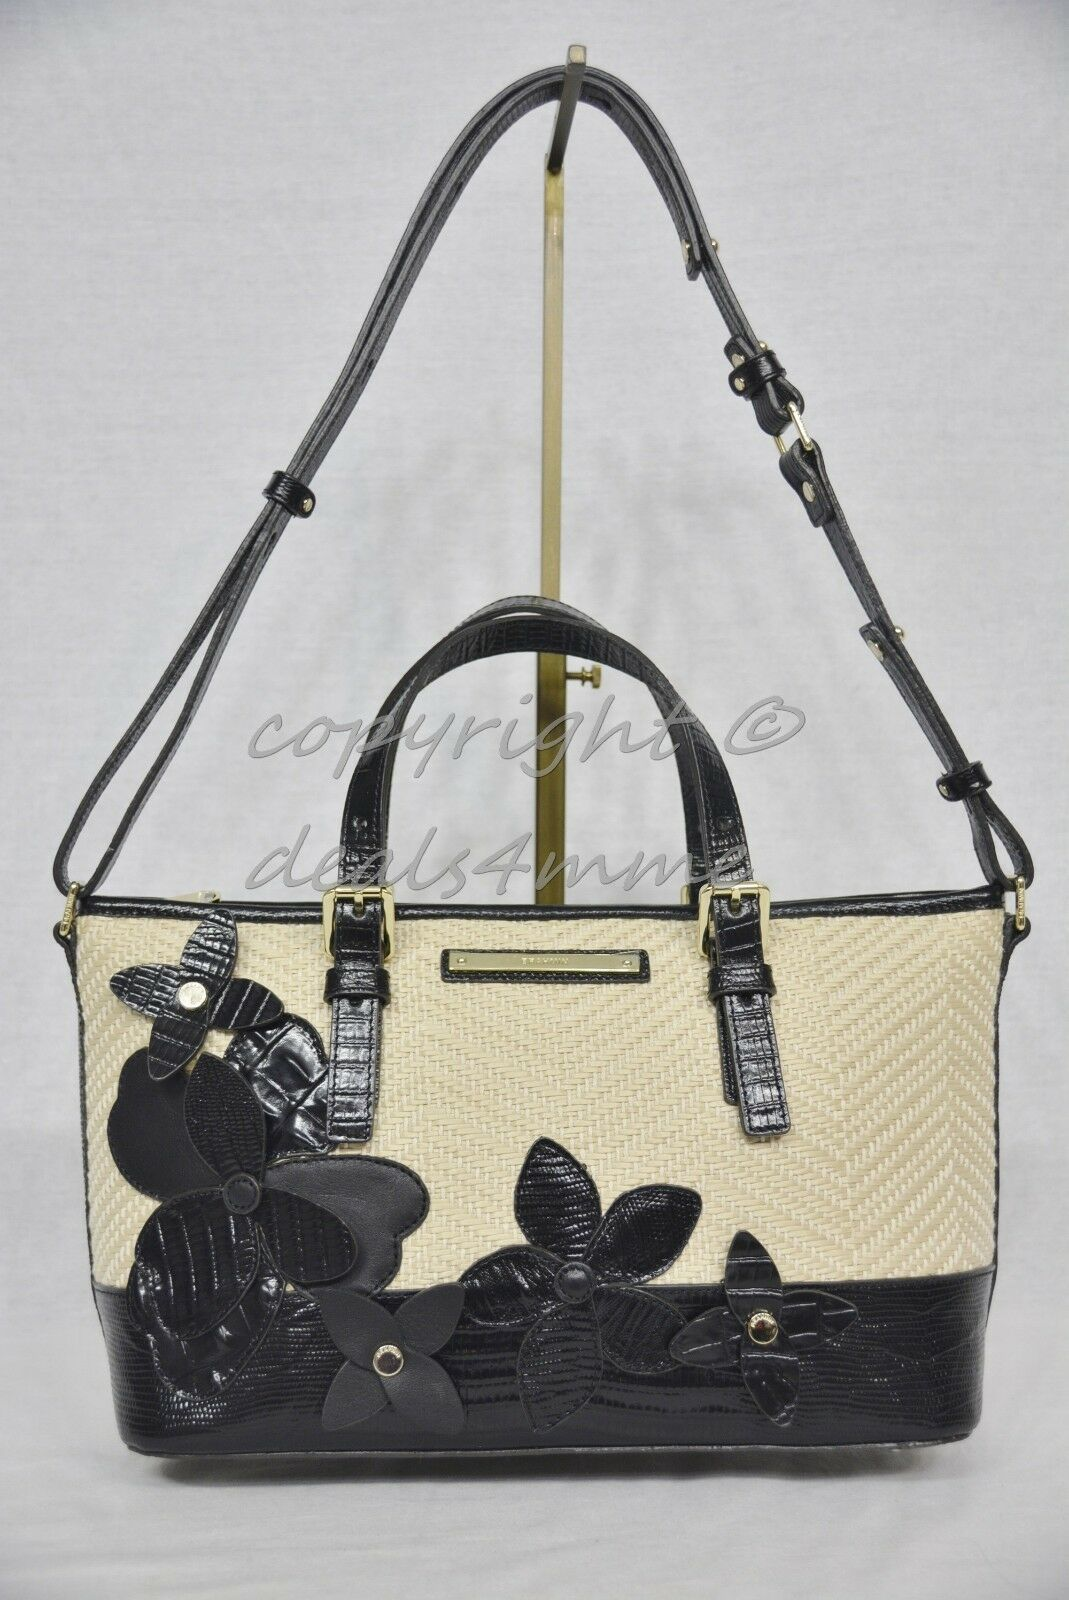 NWT Brahmin Mini Asher Satchel/Shoulder Bag in Black Miramonte-Cream with Black image 10